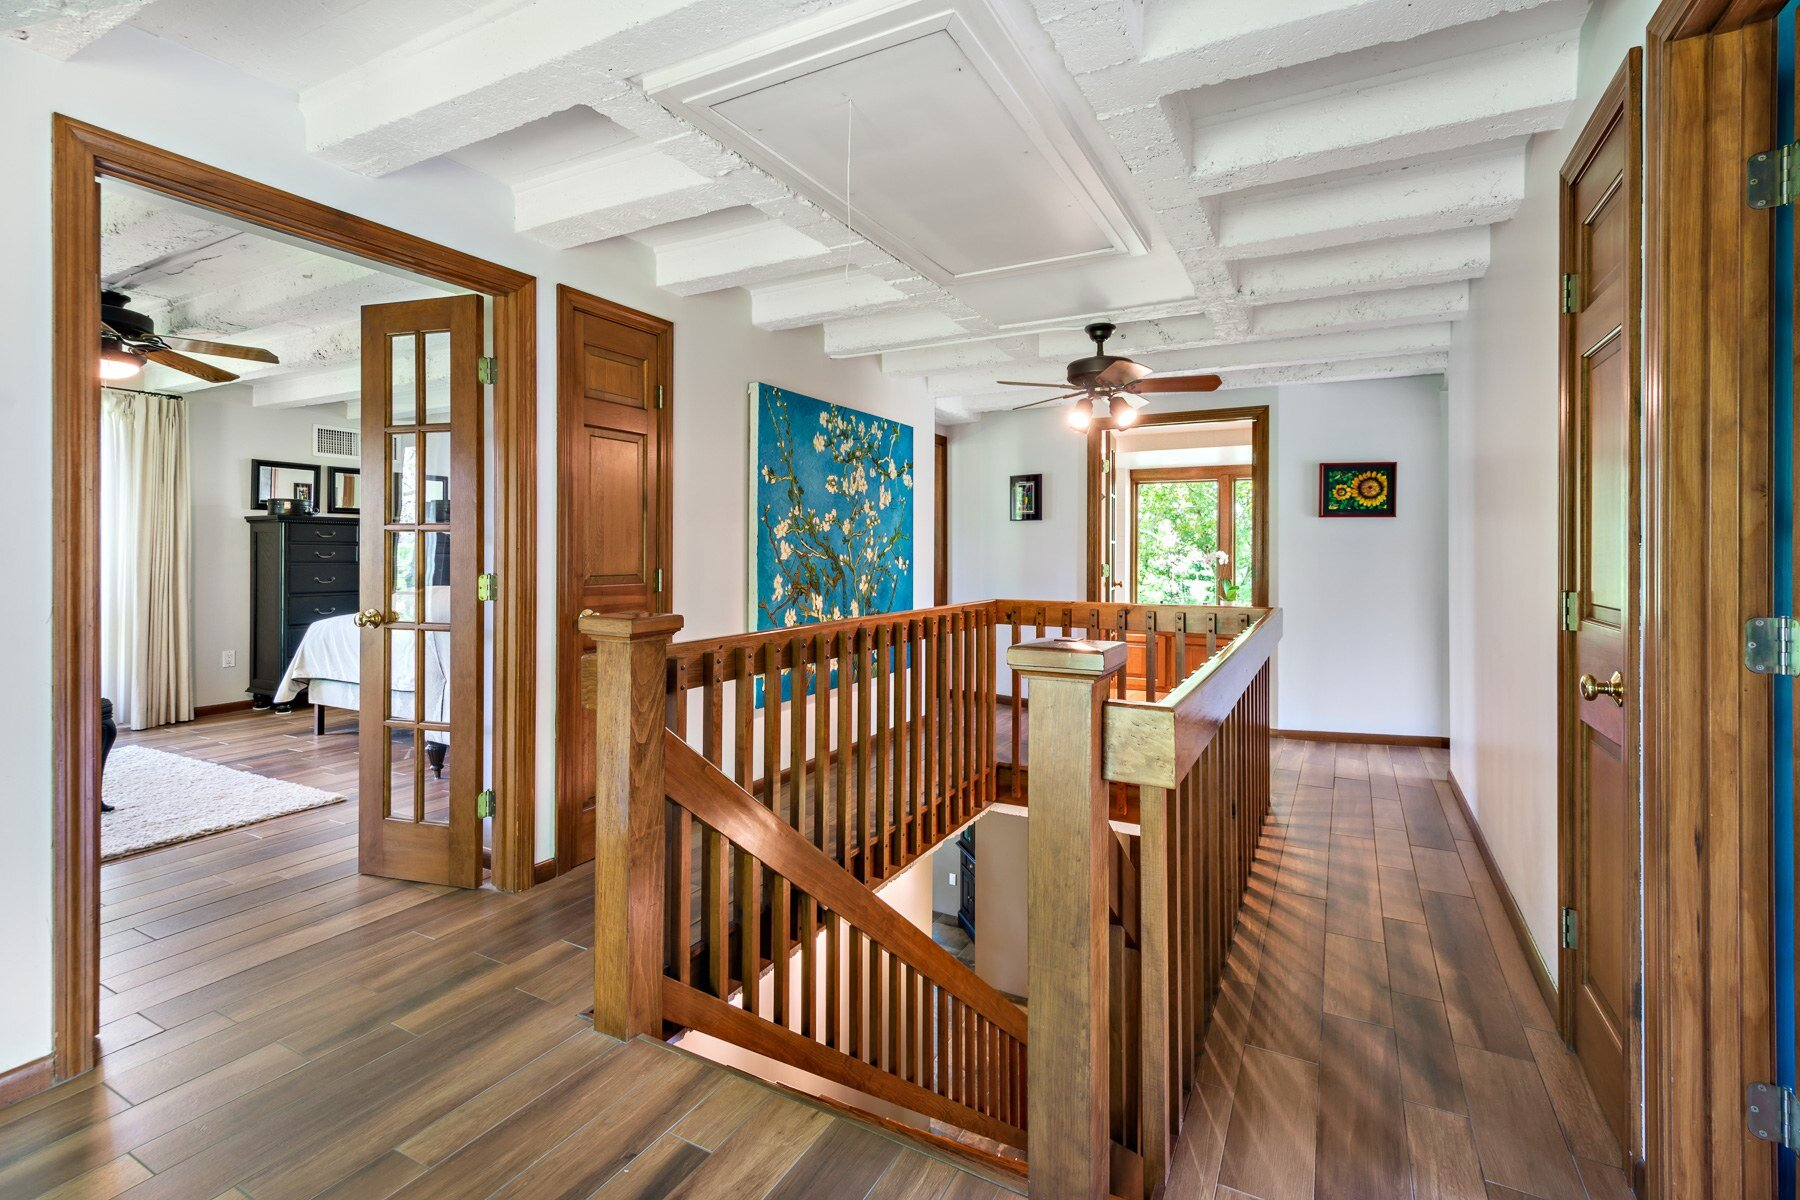 Luxe & Livable_Interior Design Blog Newport Rhode Island_13.jpg